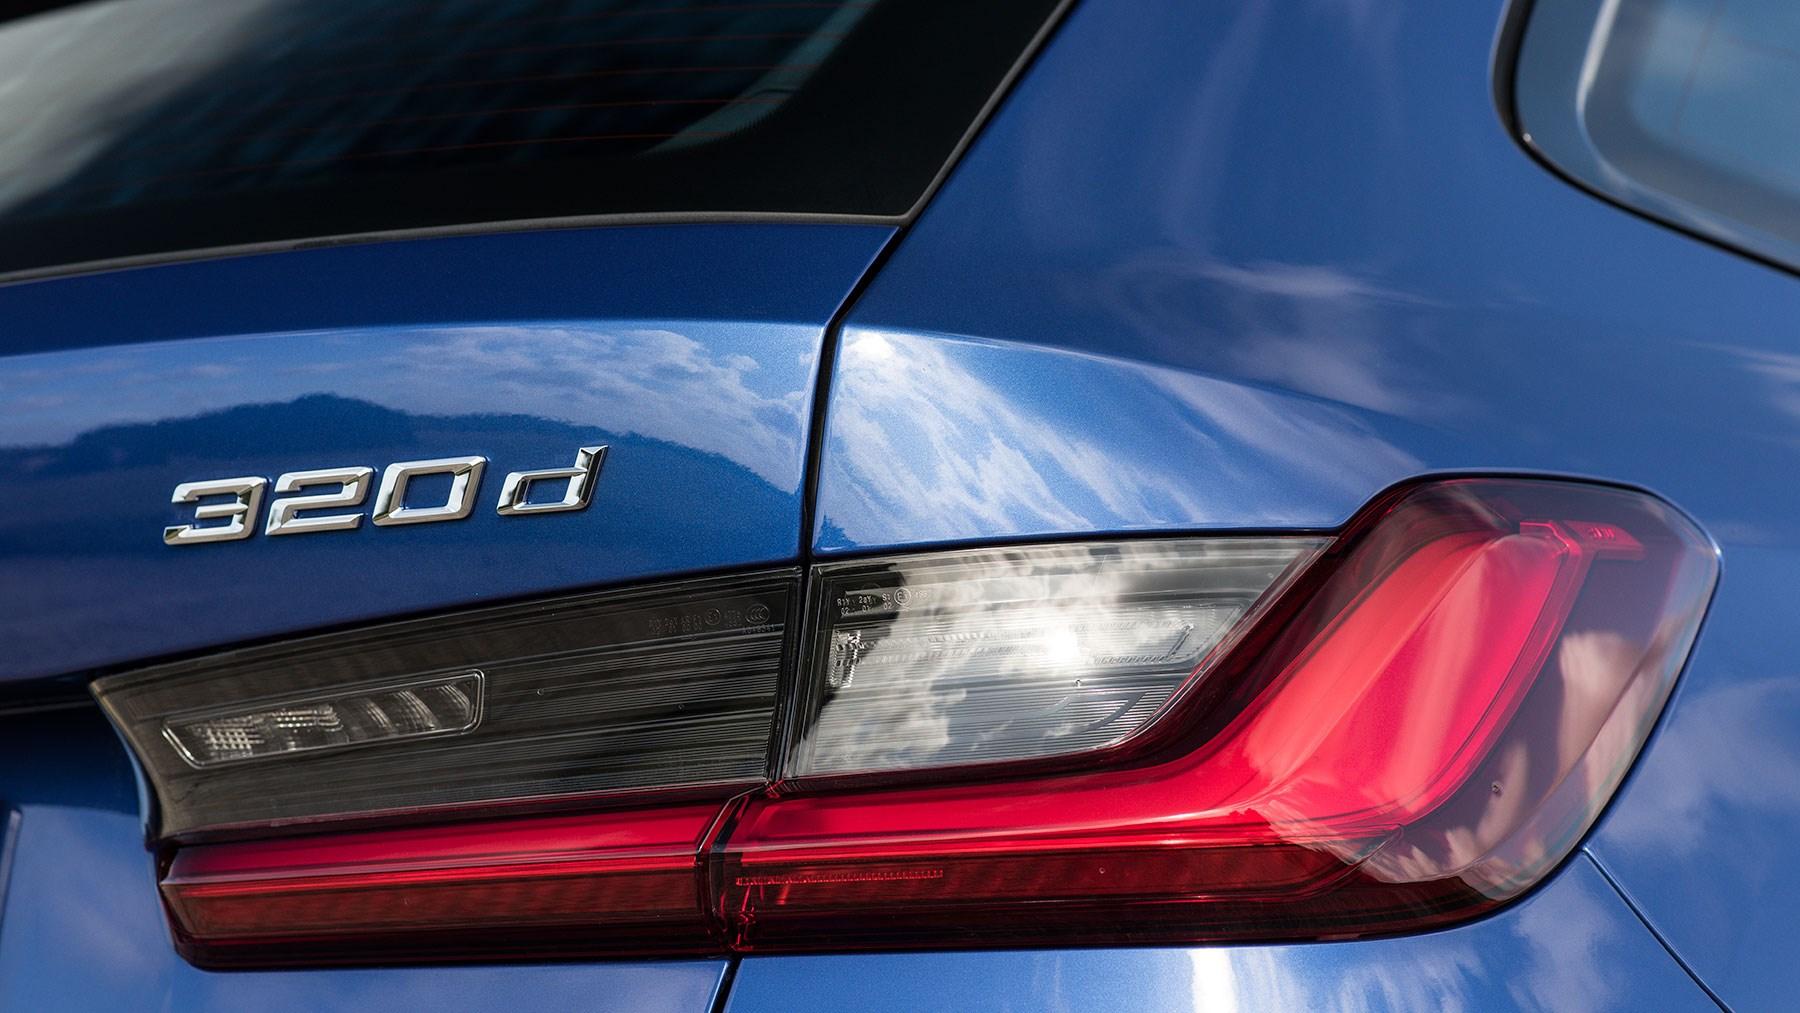 BMW 320d Touring badge